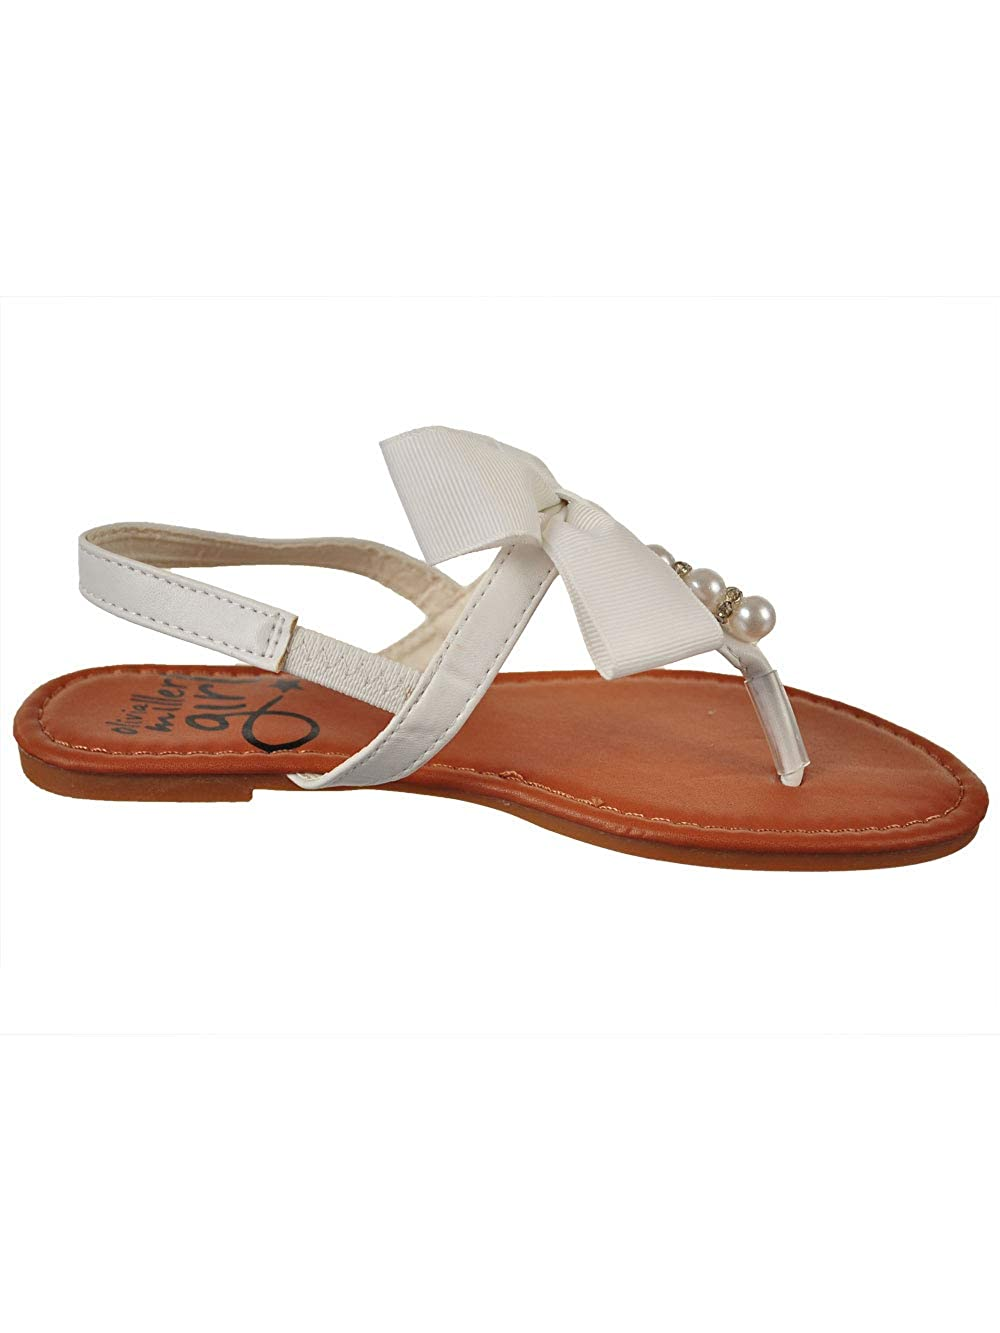 Olivia Miller OMGirl Girls Lilian White Polyurethane and Cotton Sandals